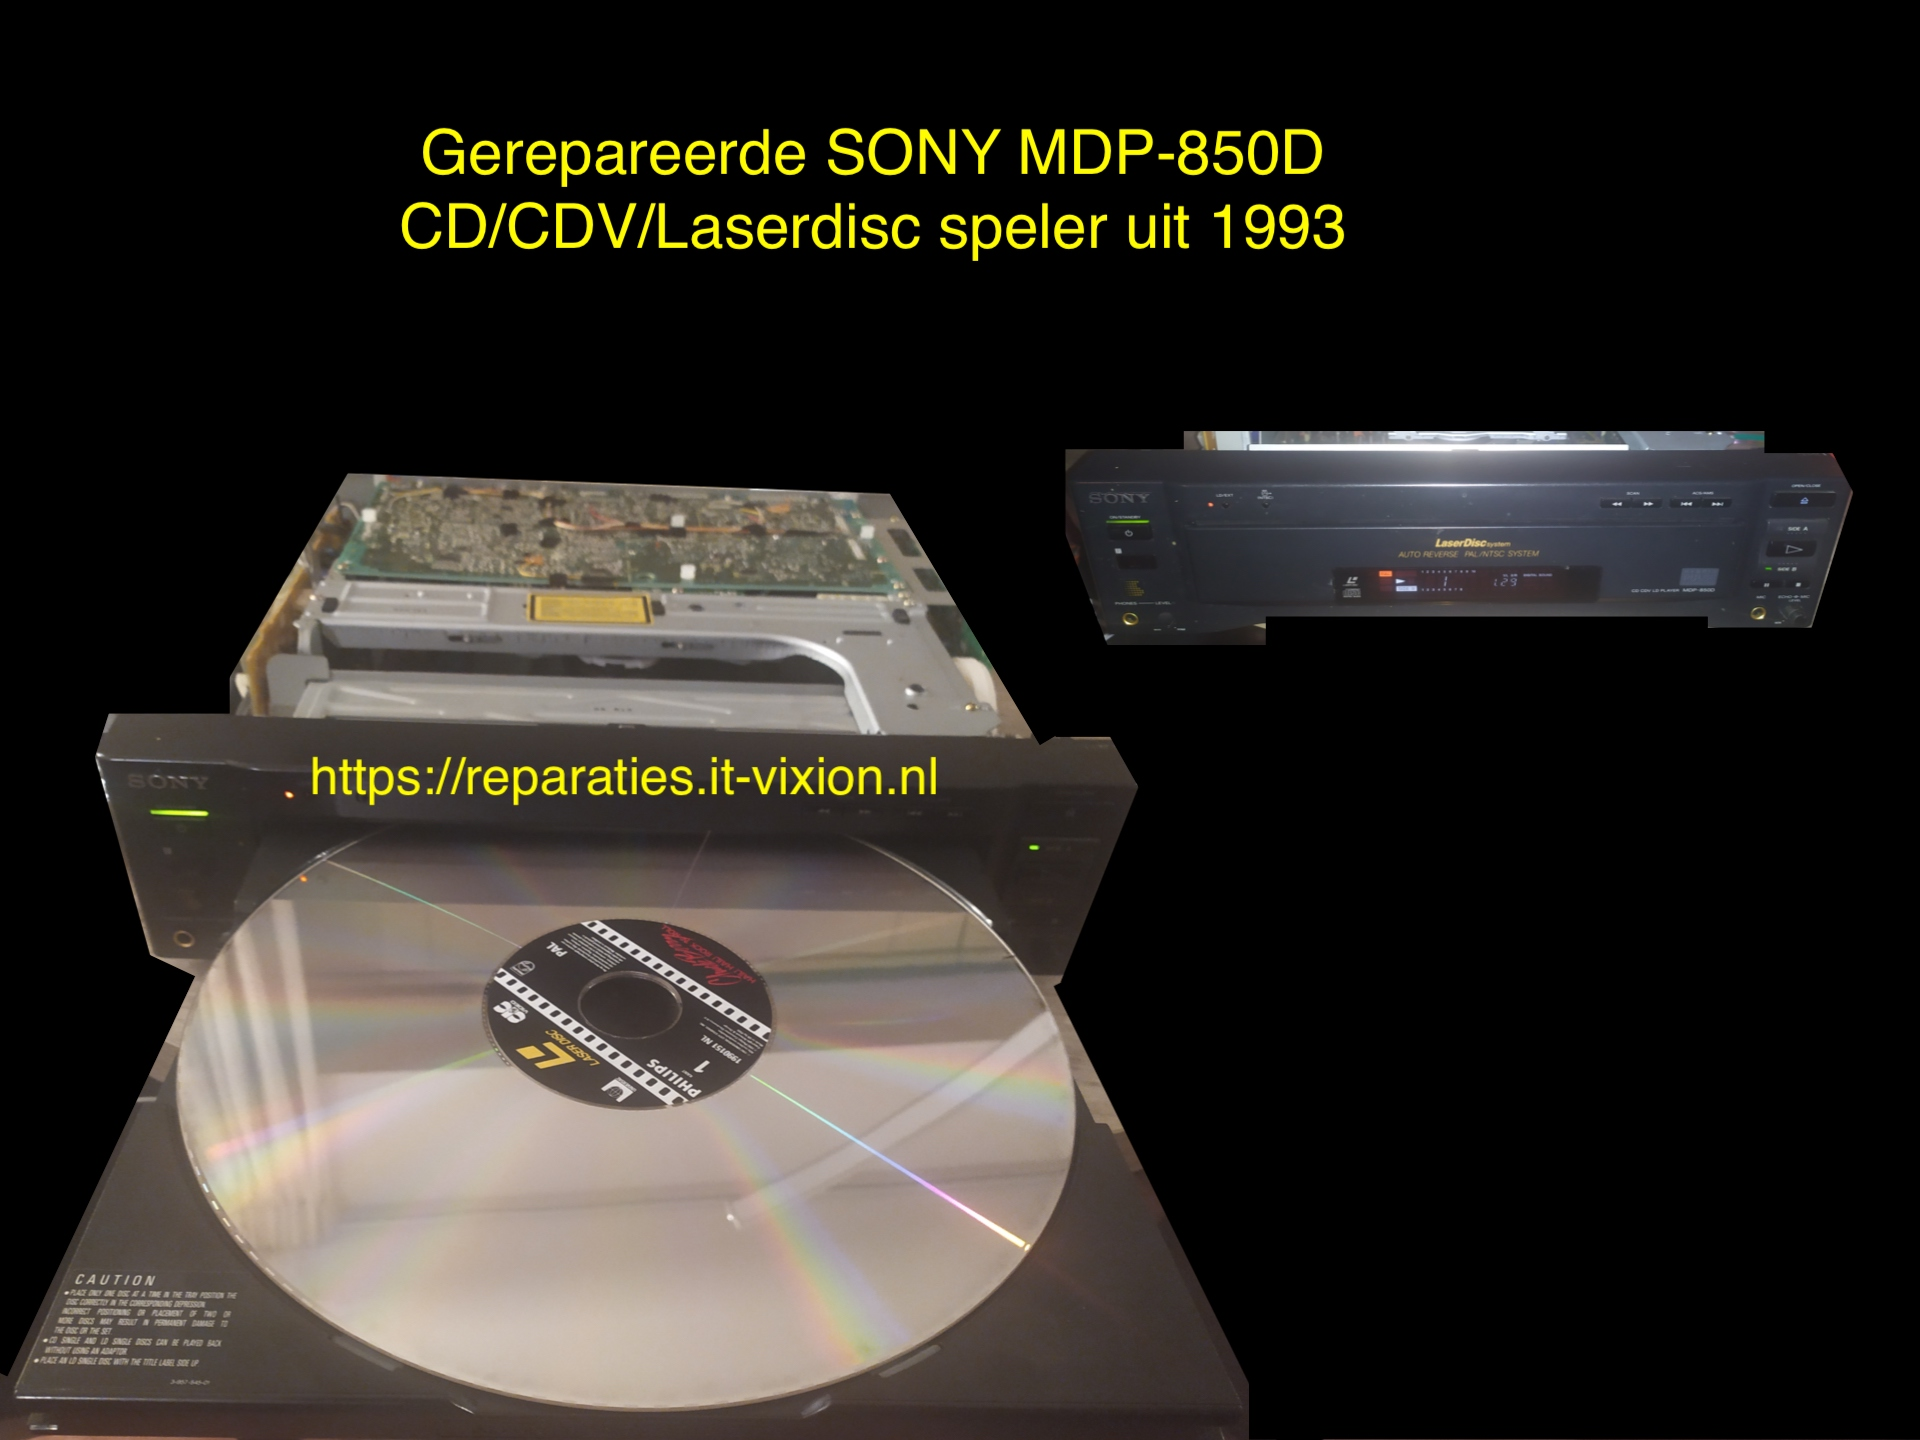 Sony MDP-850D laserdisc